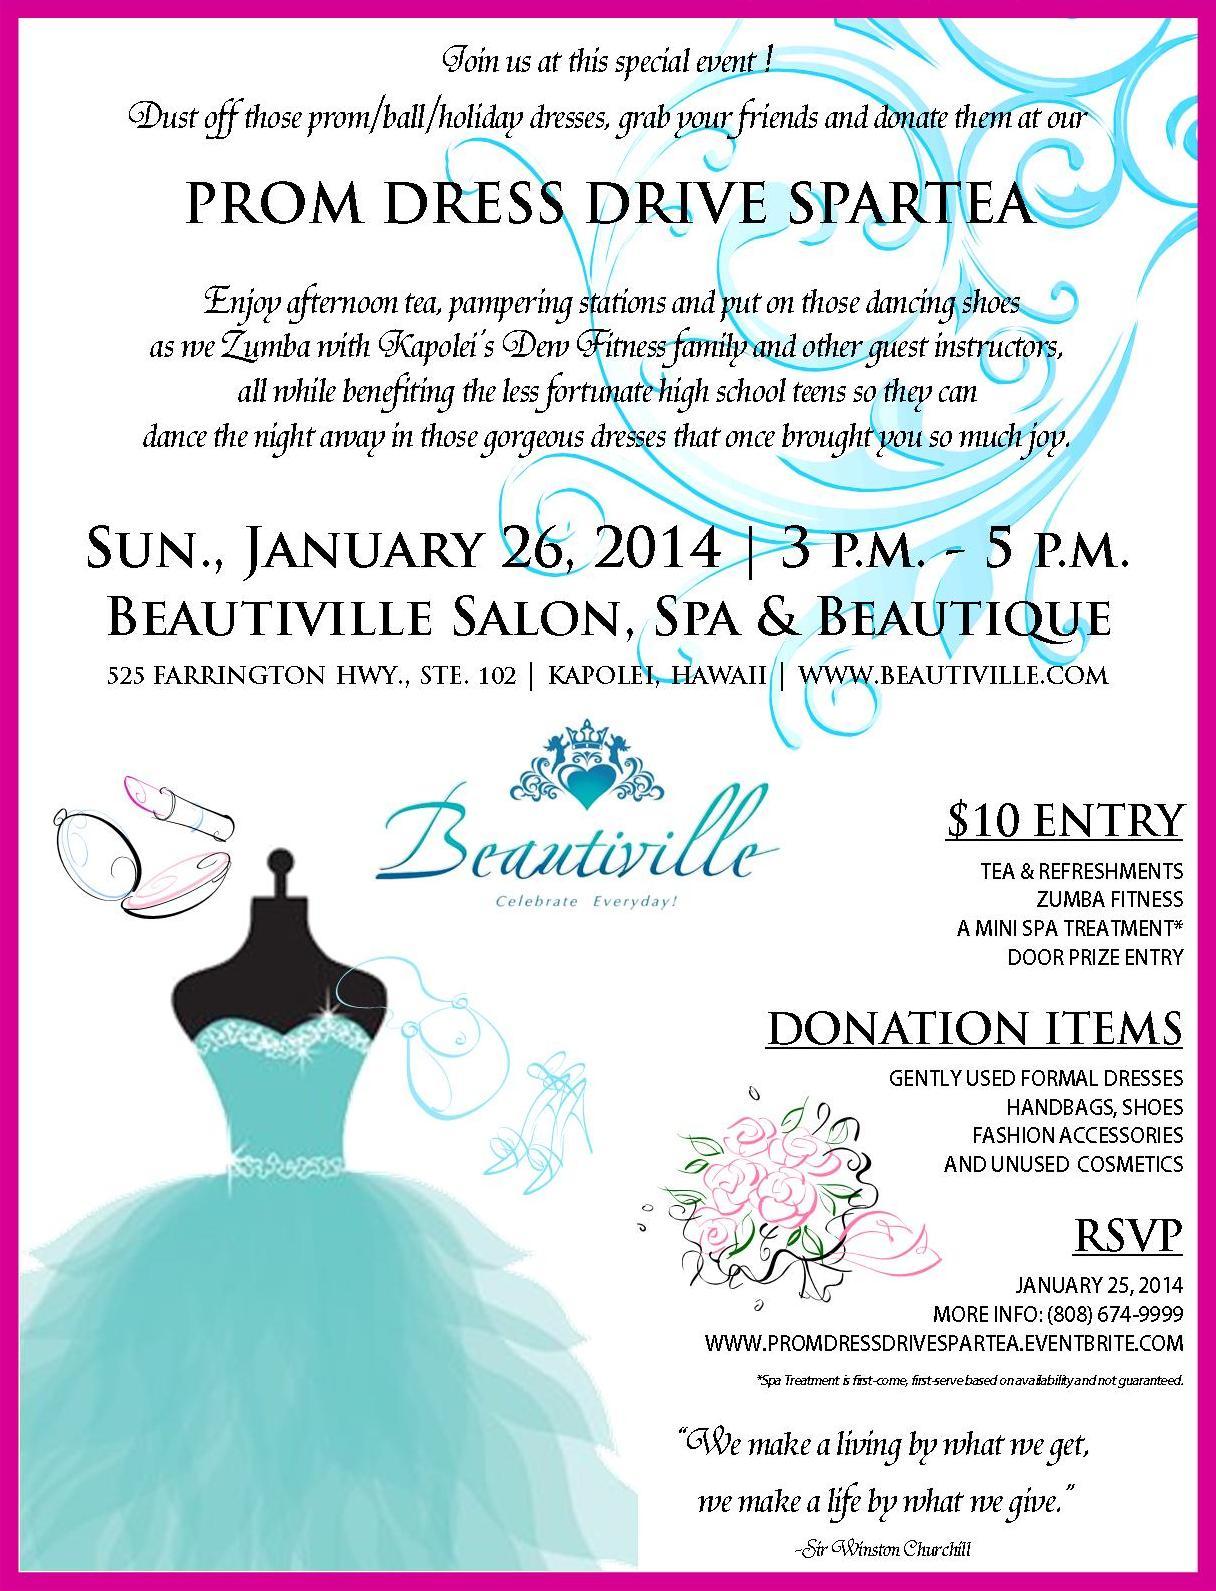 Beautiville Prom Dress Drive Spartea - January 2014